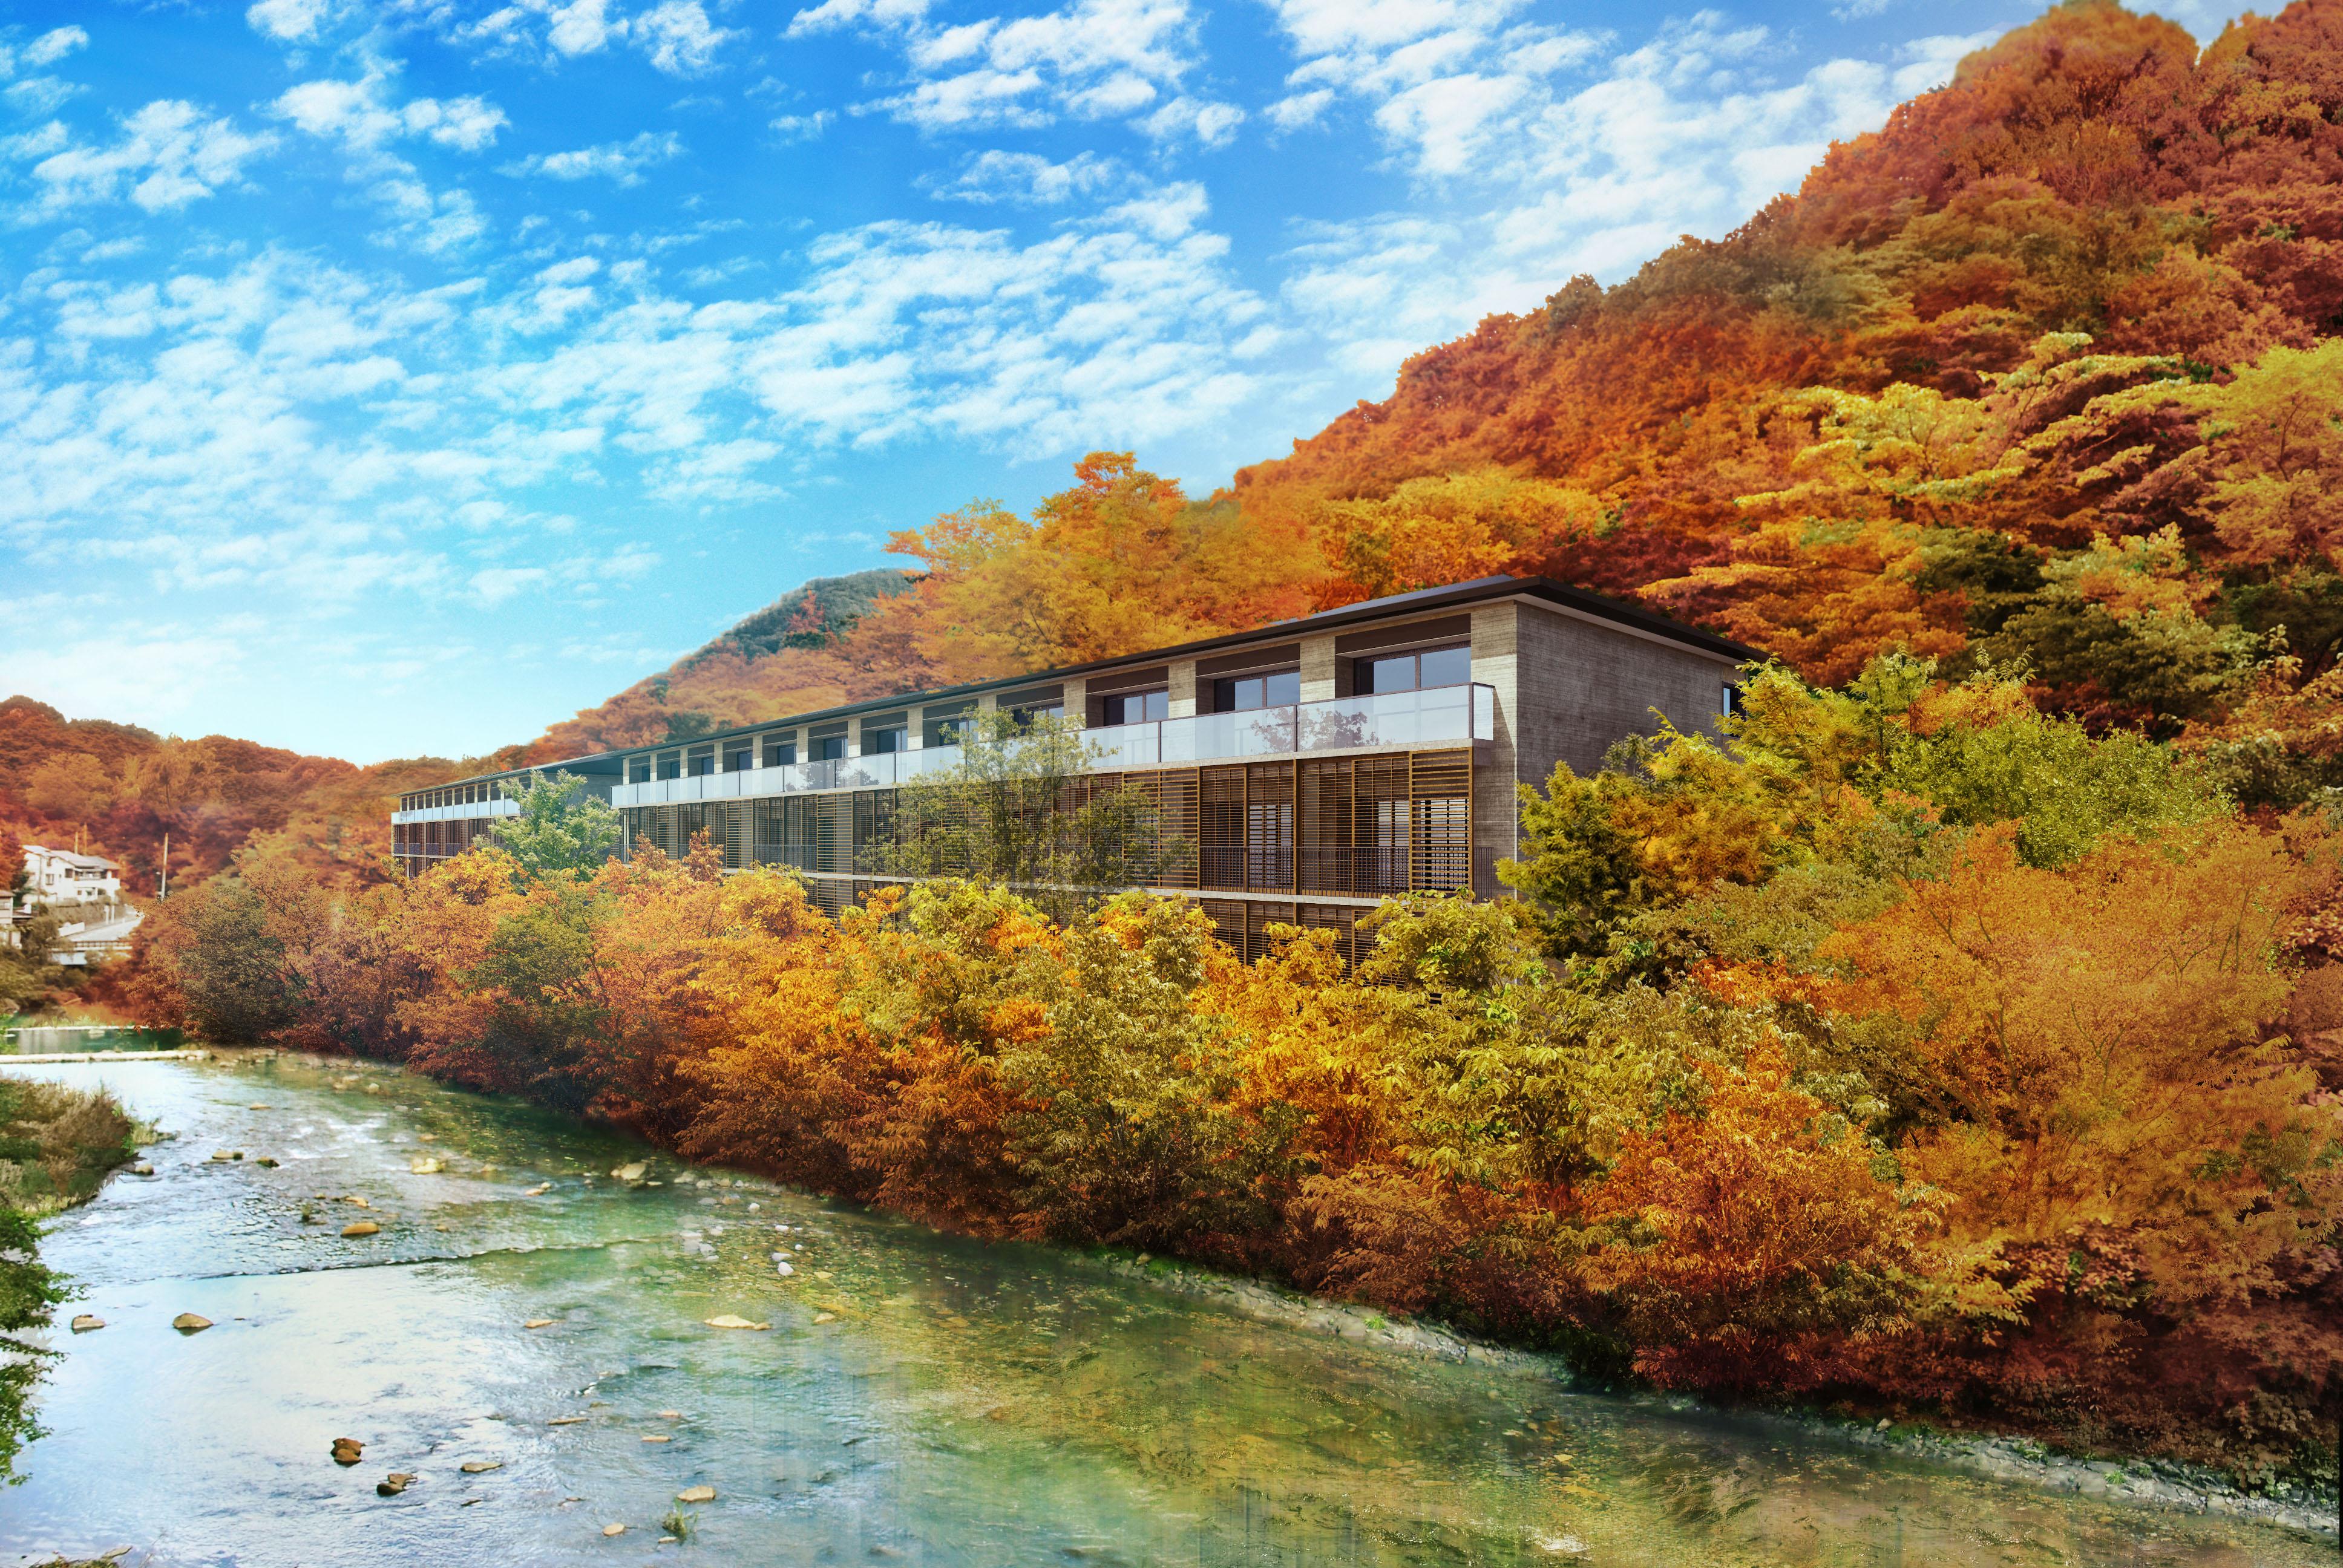 Hotel Indigo Hakone Gora Render 1